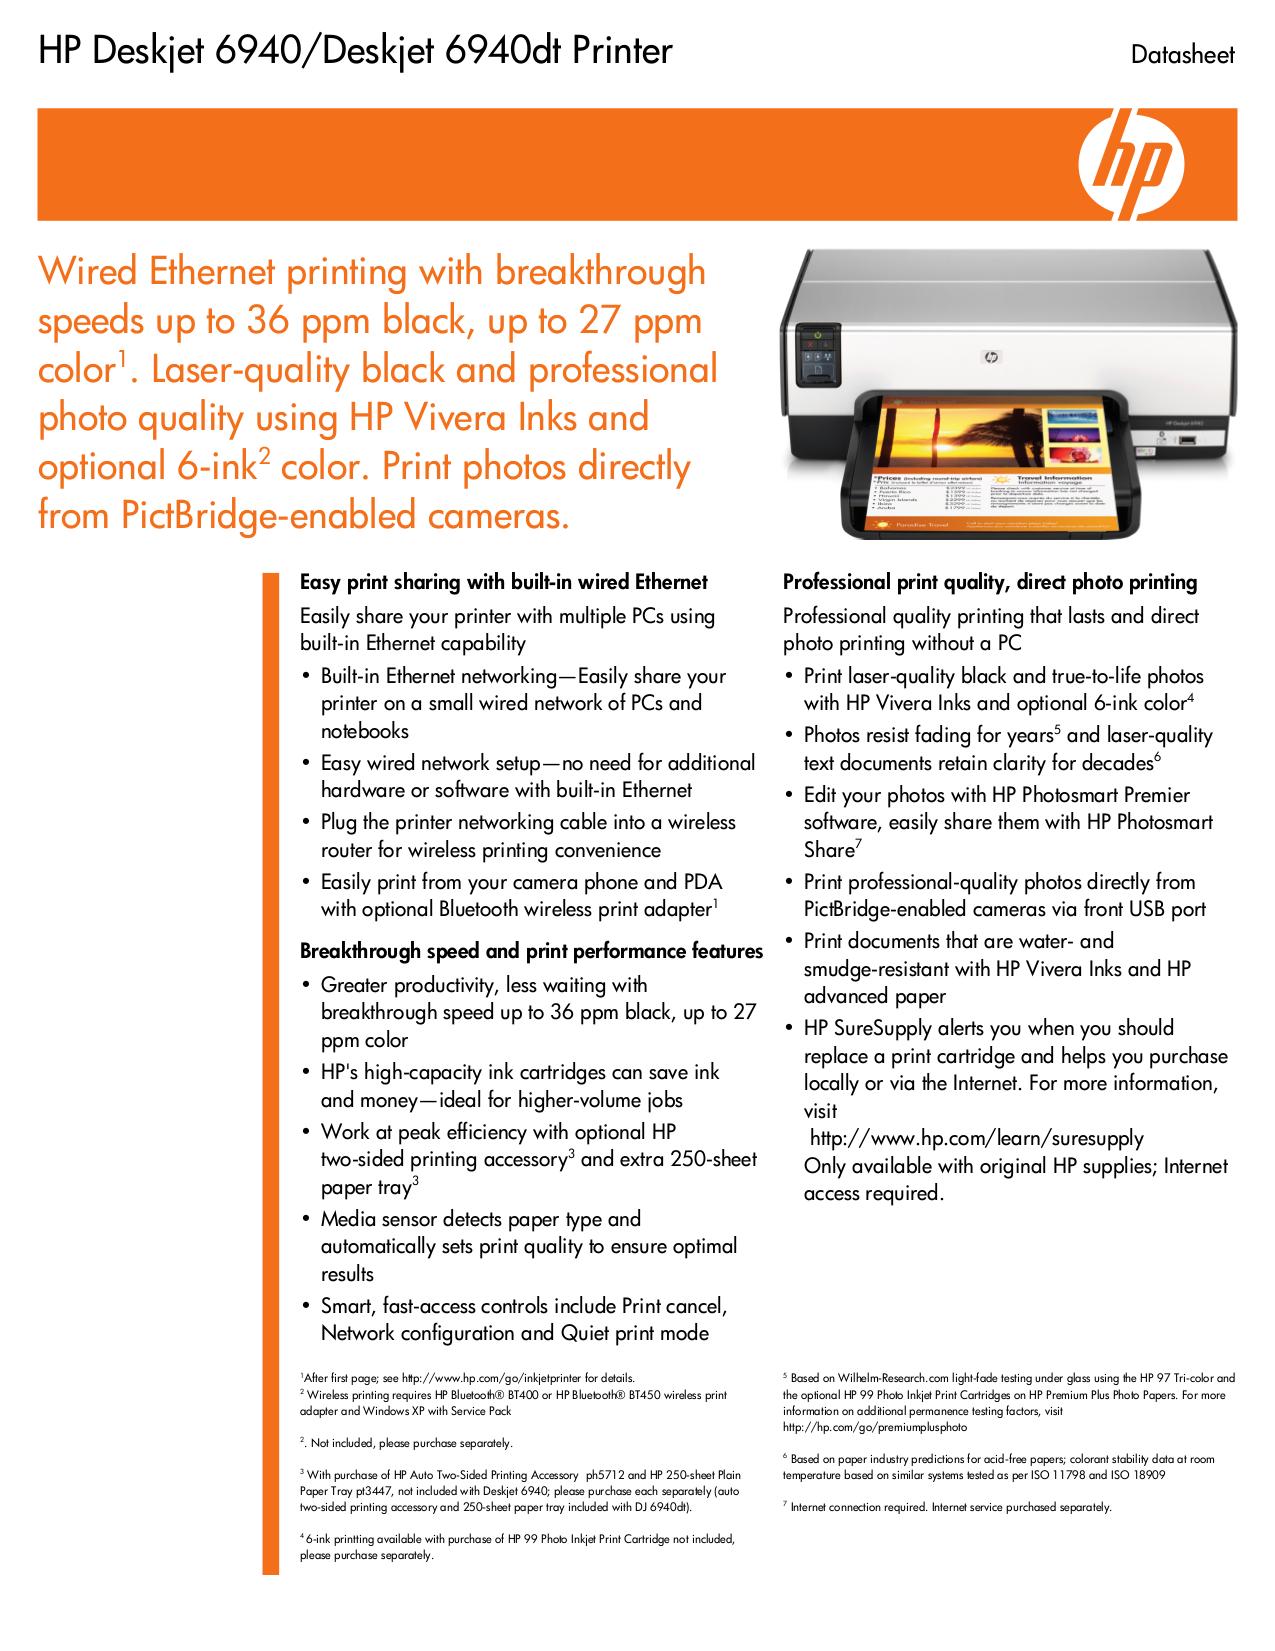 download free pdf for hp deskjet 6940 printer manual rh umlib com HP 6940 Printer Installation HP 6940 Instruction Manual